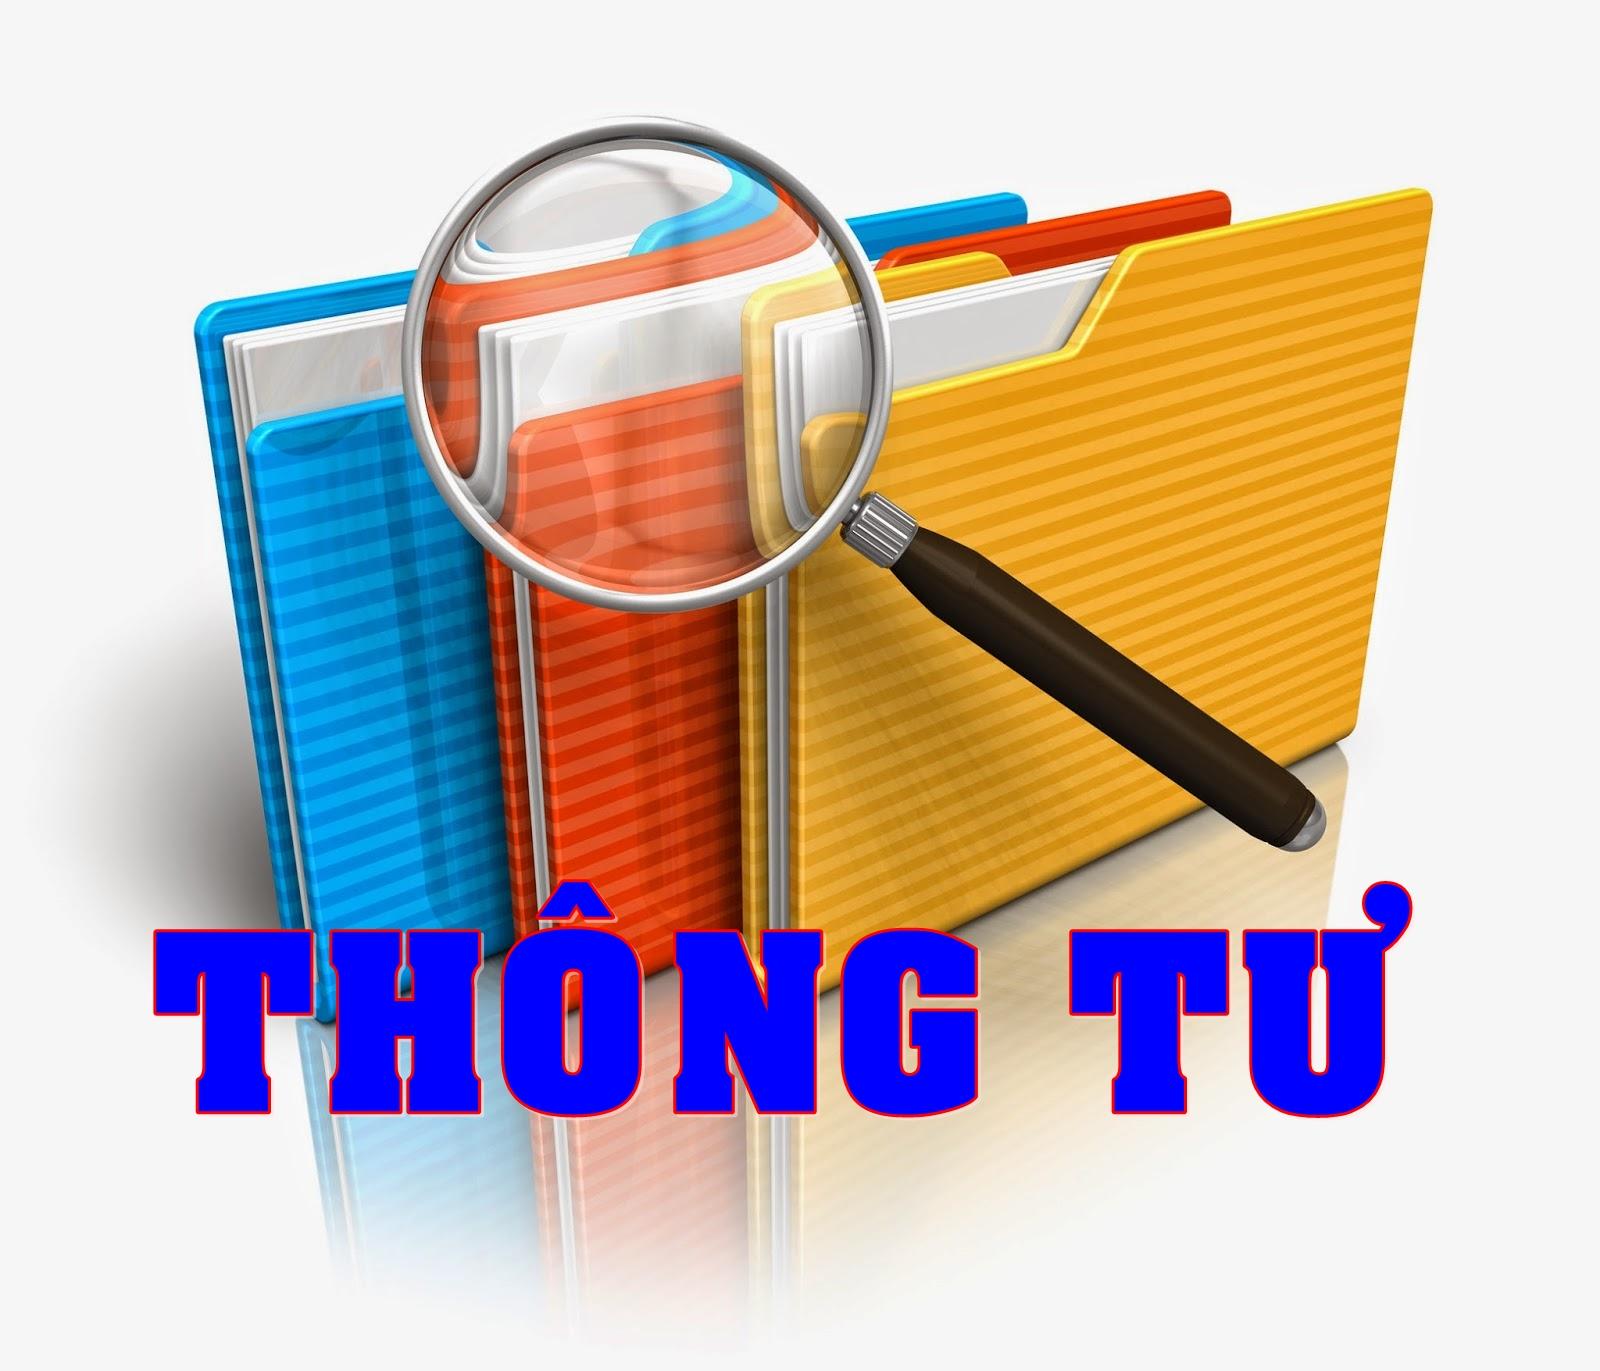 thong-tu-van-ban-moi-ban-hanh